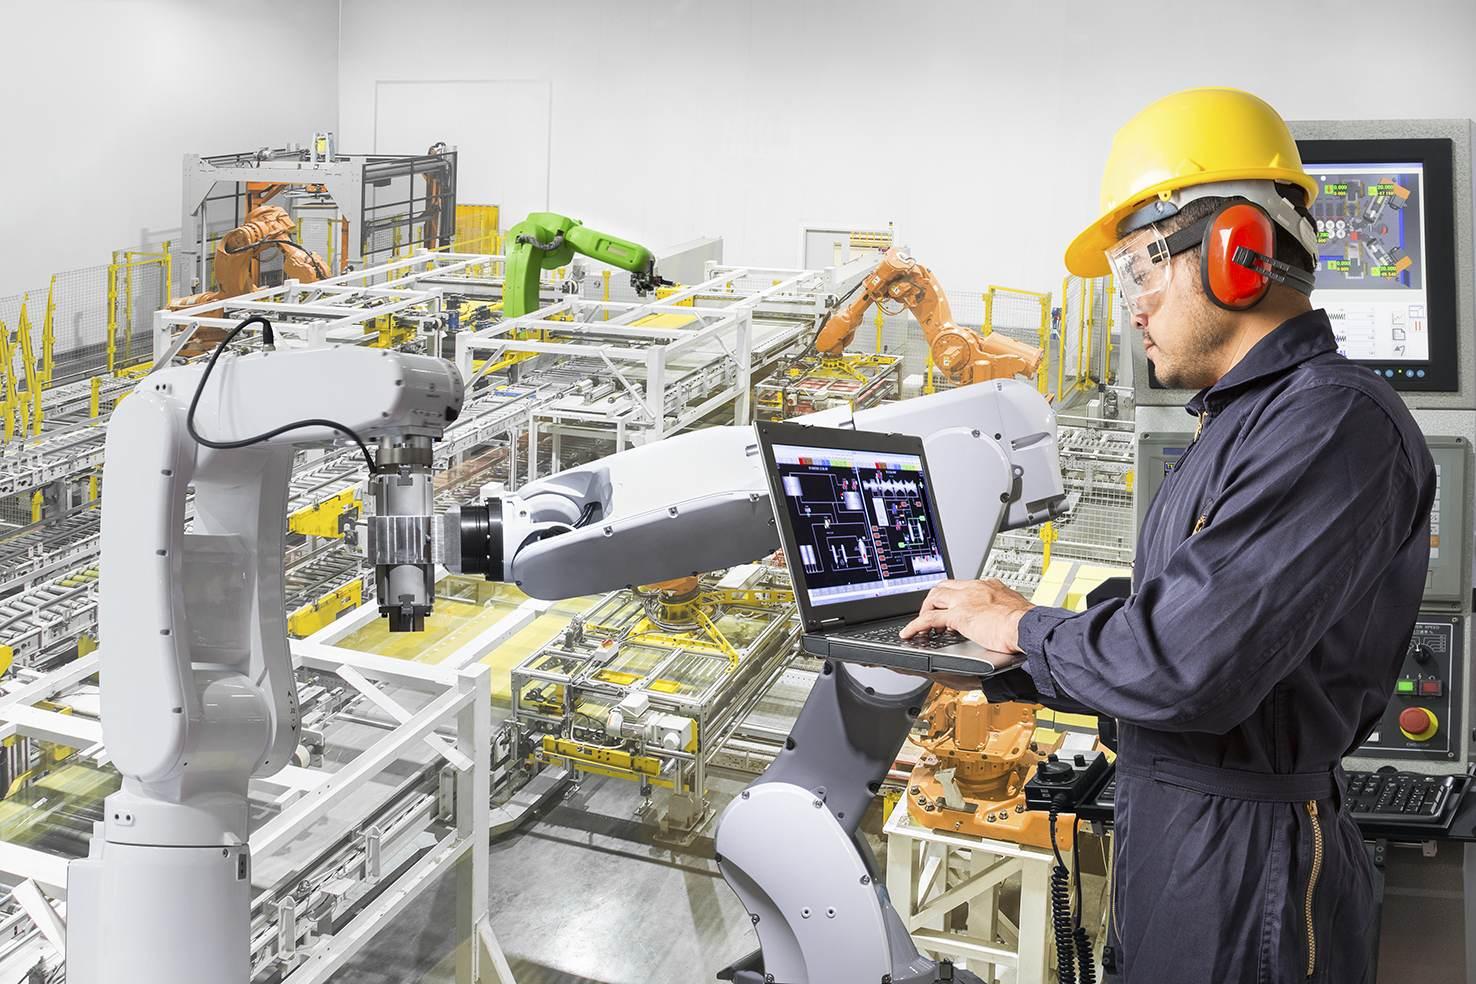 technicien en maintenance informatique